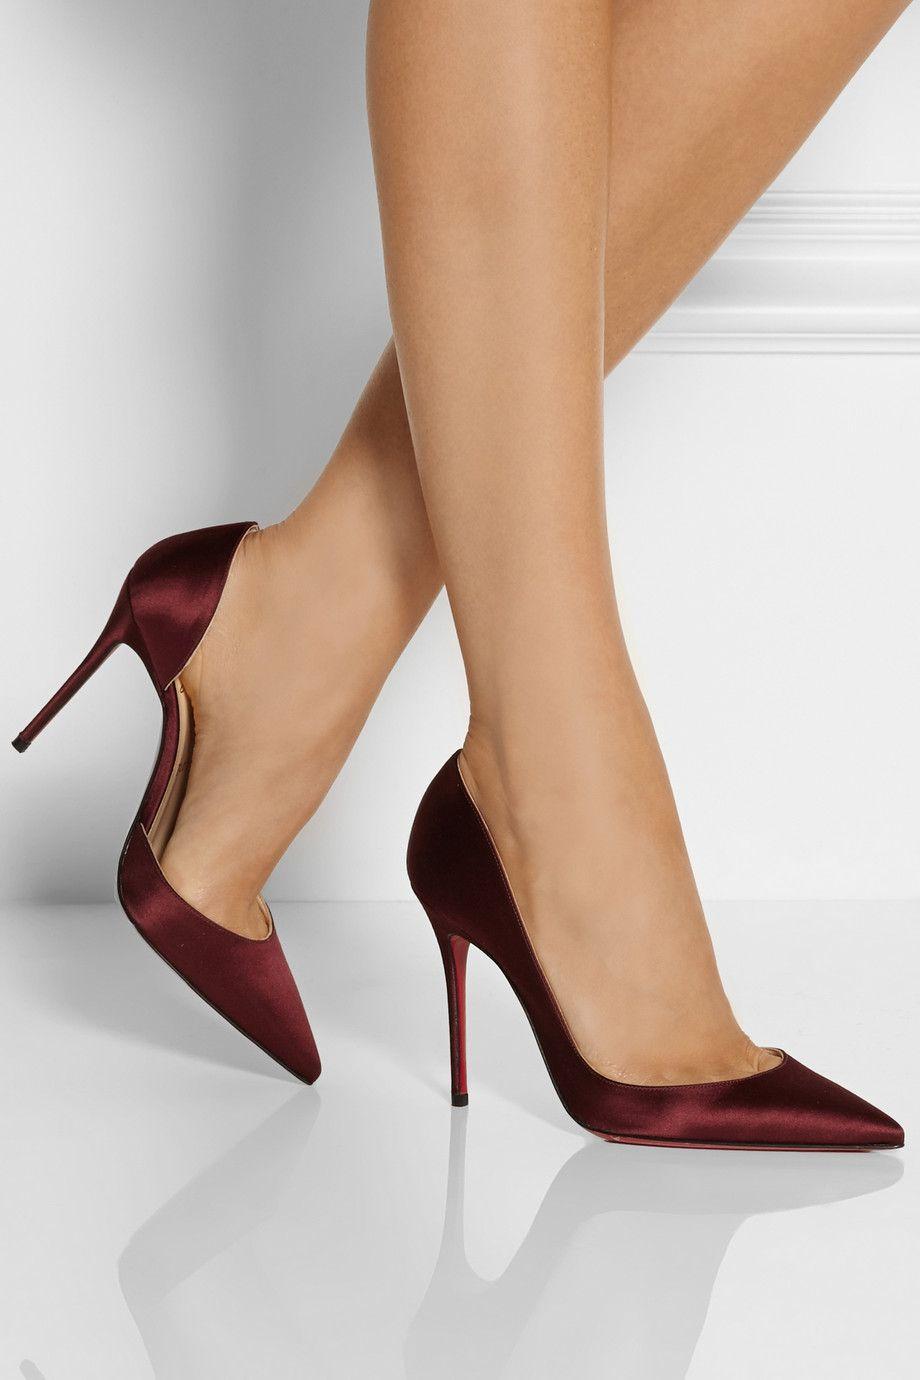 christian louboutin 4 inch heels